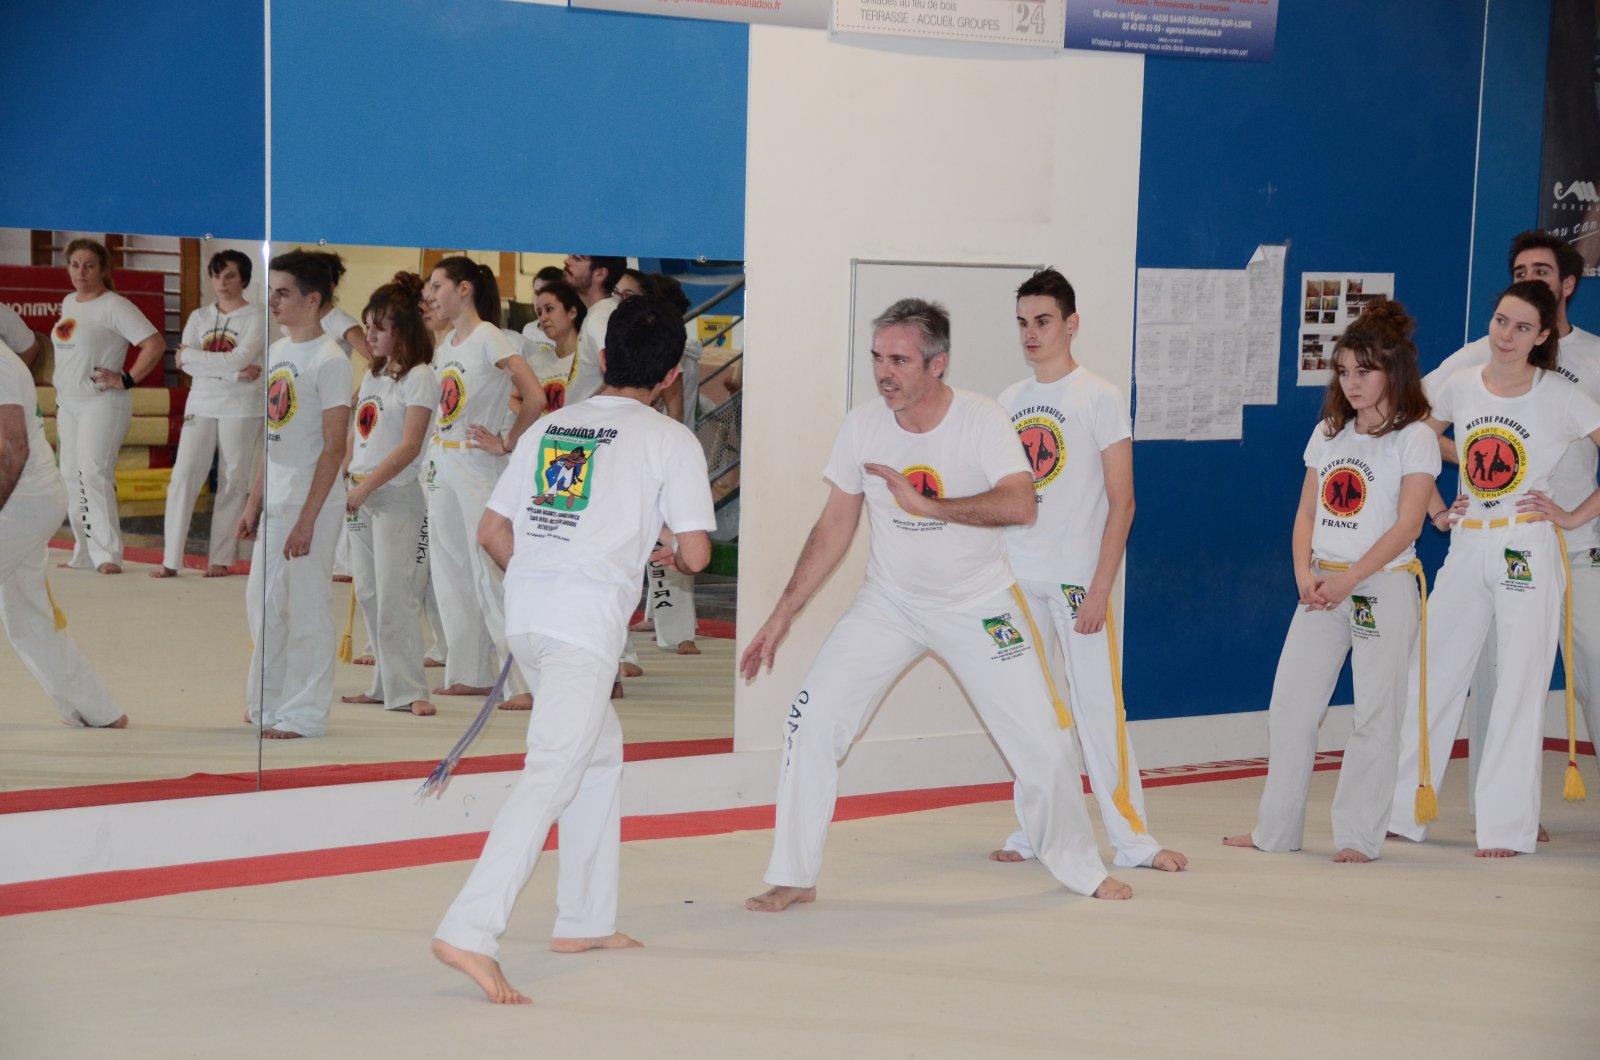 Roda E Galette 2018 Capoeira Nantes (22)